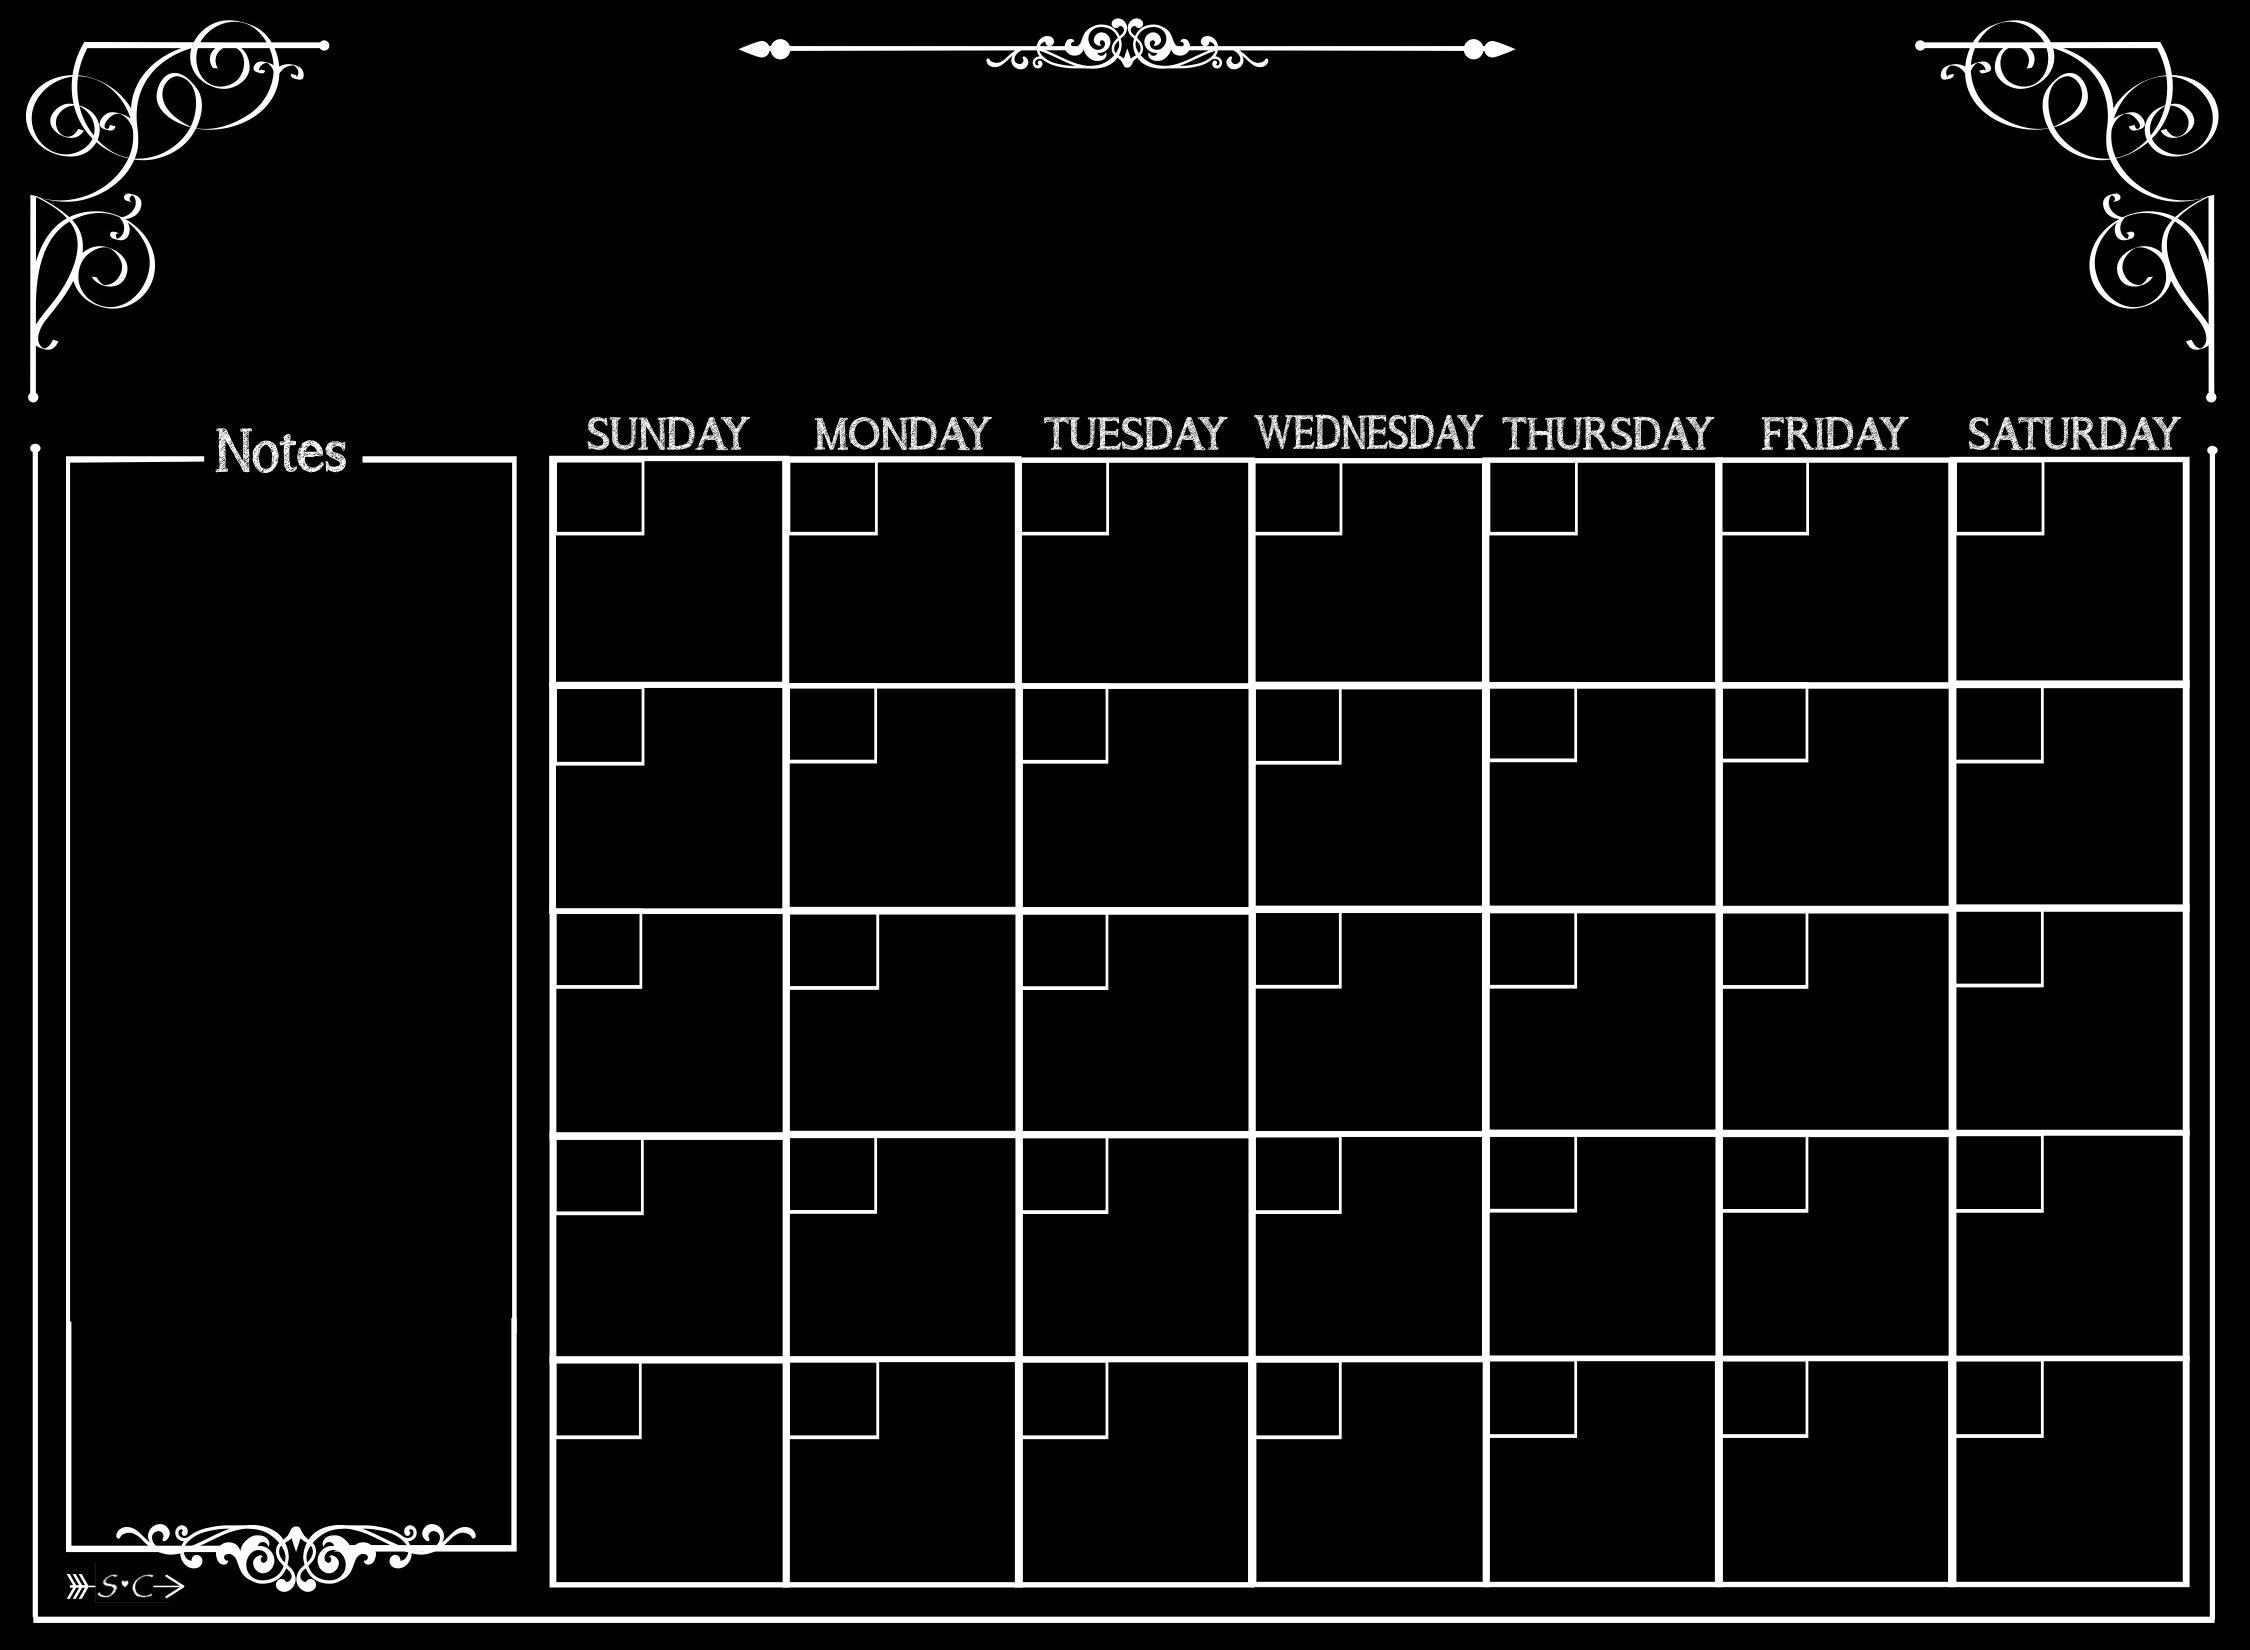 Calendar | Magnetic Chalkboard Style Refrigerator Calendar | Monthly Organizer | Dry Erase Board | Large Calendar | Kitchen Organizer | Smooth Black Surface | Waterproof | 11 x 15 inches